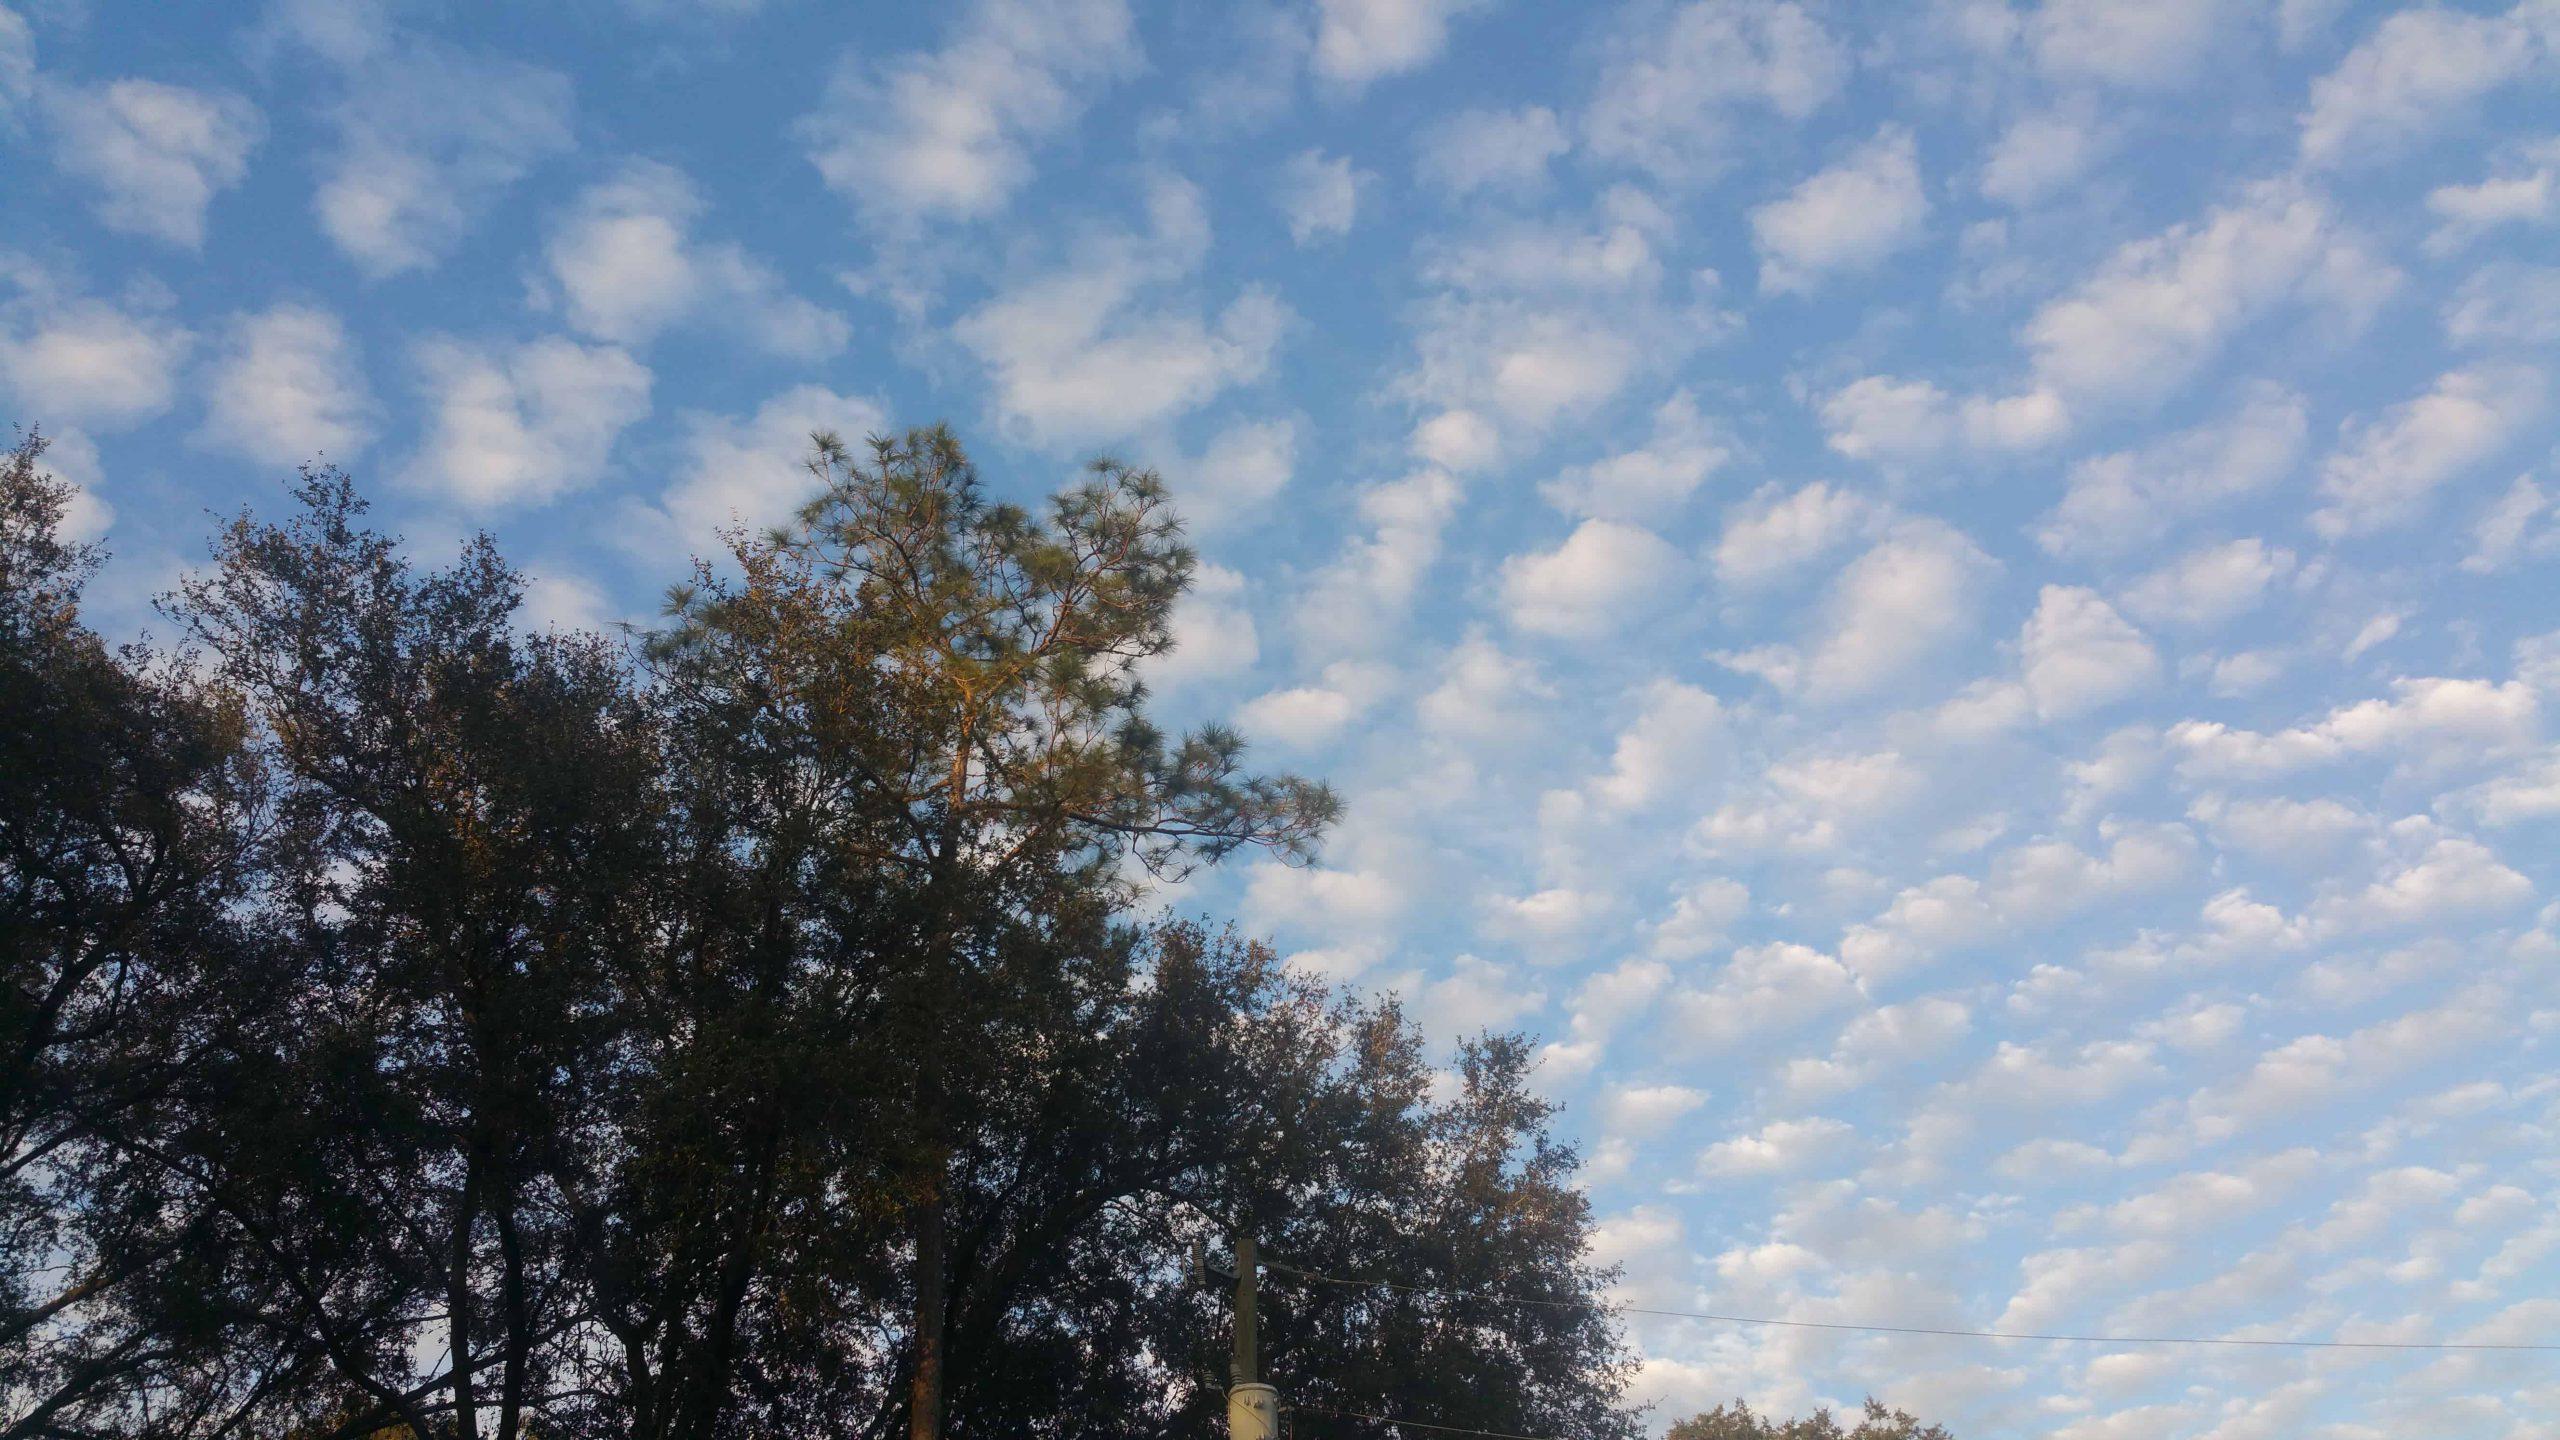 Clouds - December 14, 2017 - 4